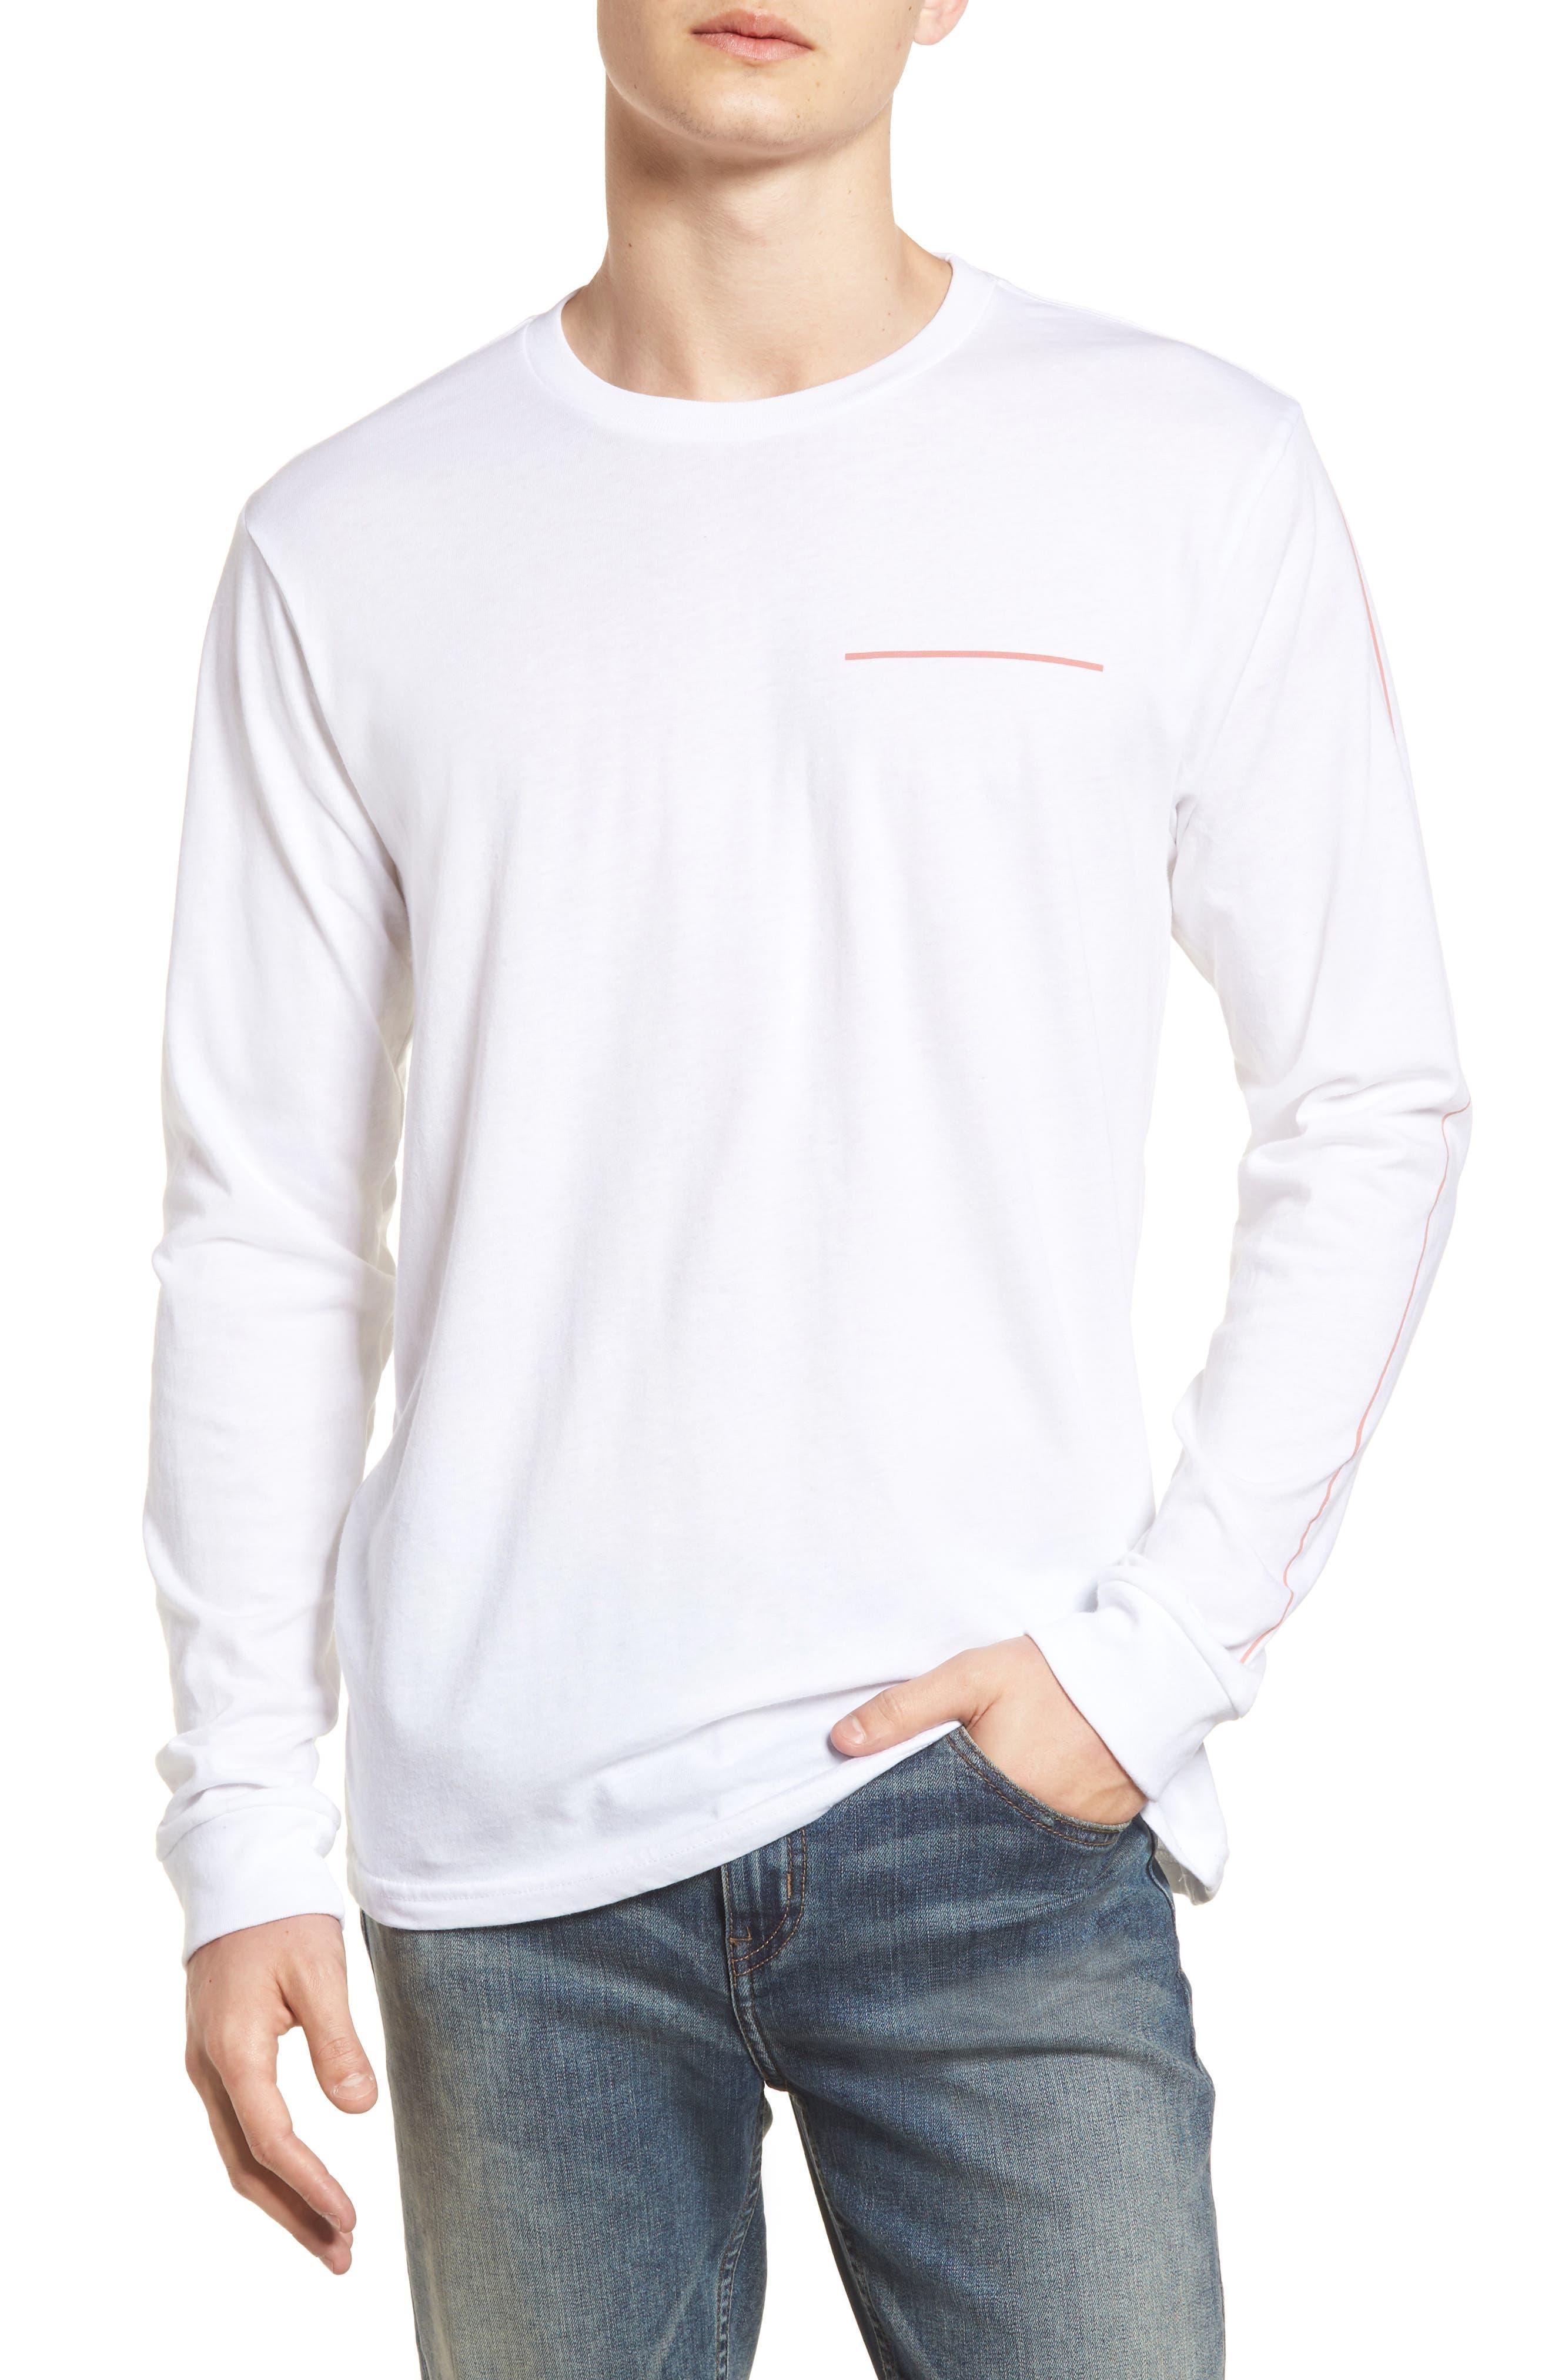 Soto Graphic T-Shirt,                             Main thumbnail 1, color,                             White